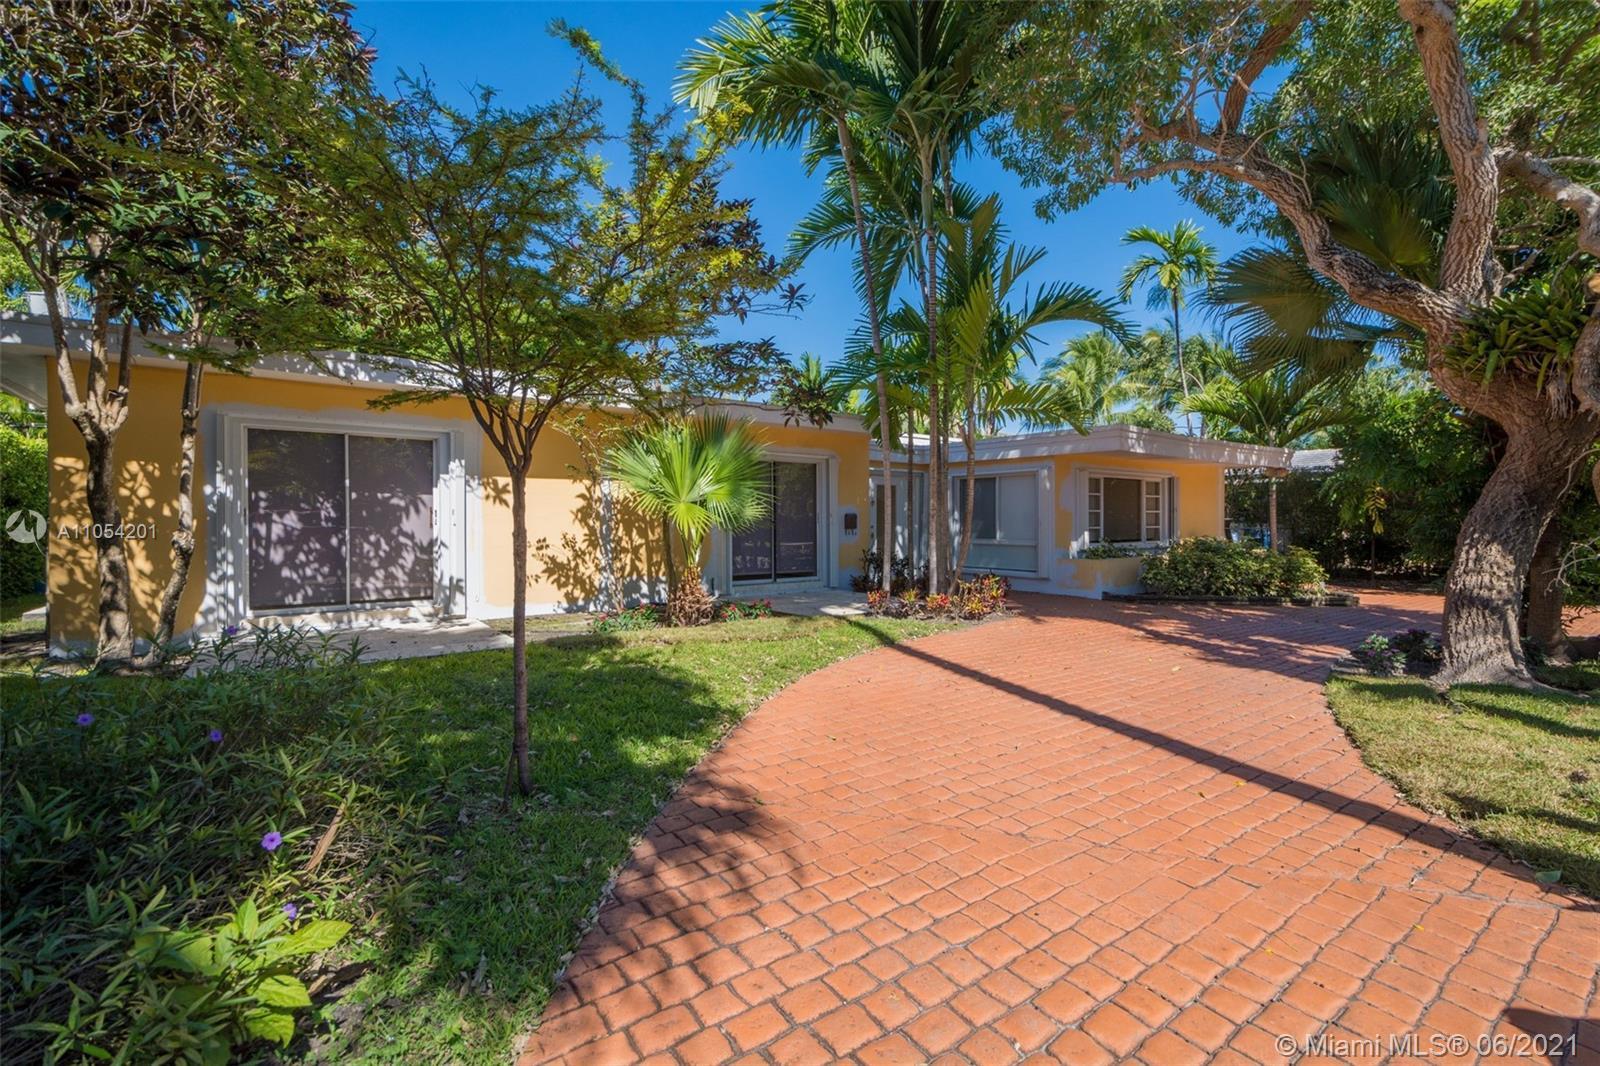 Tropical Isle Homes - 310 Harbor CT, Key Biscayne, FL 33149